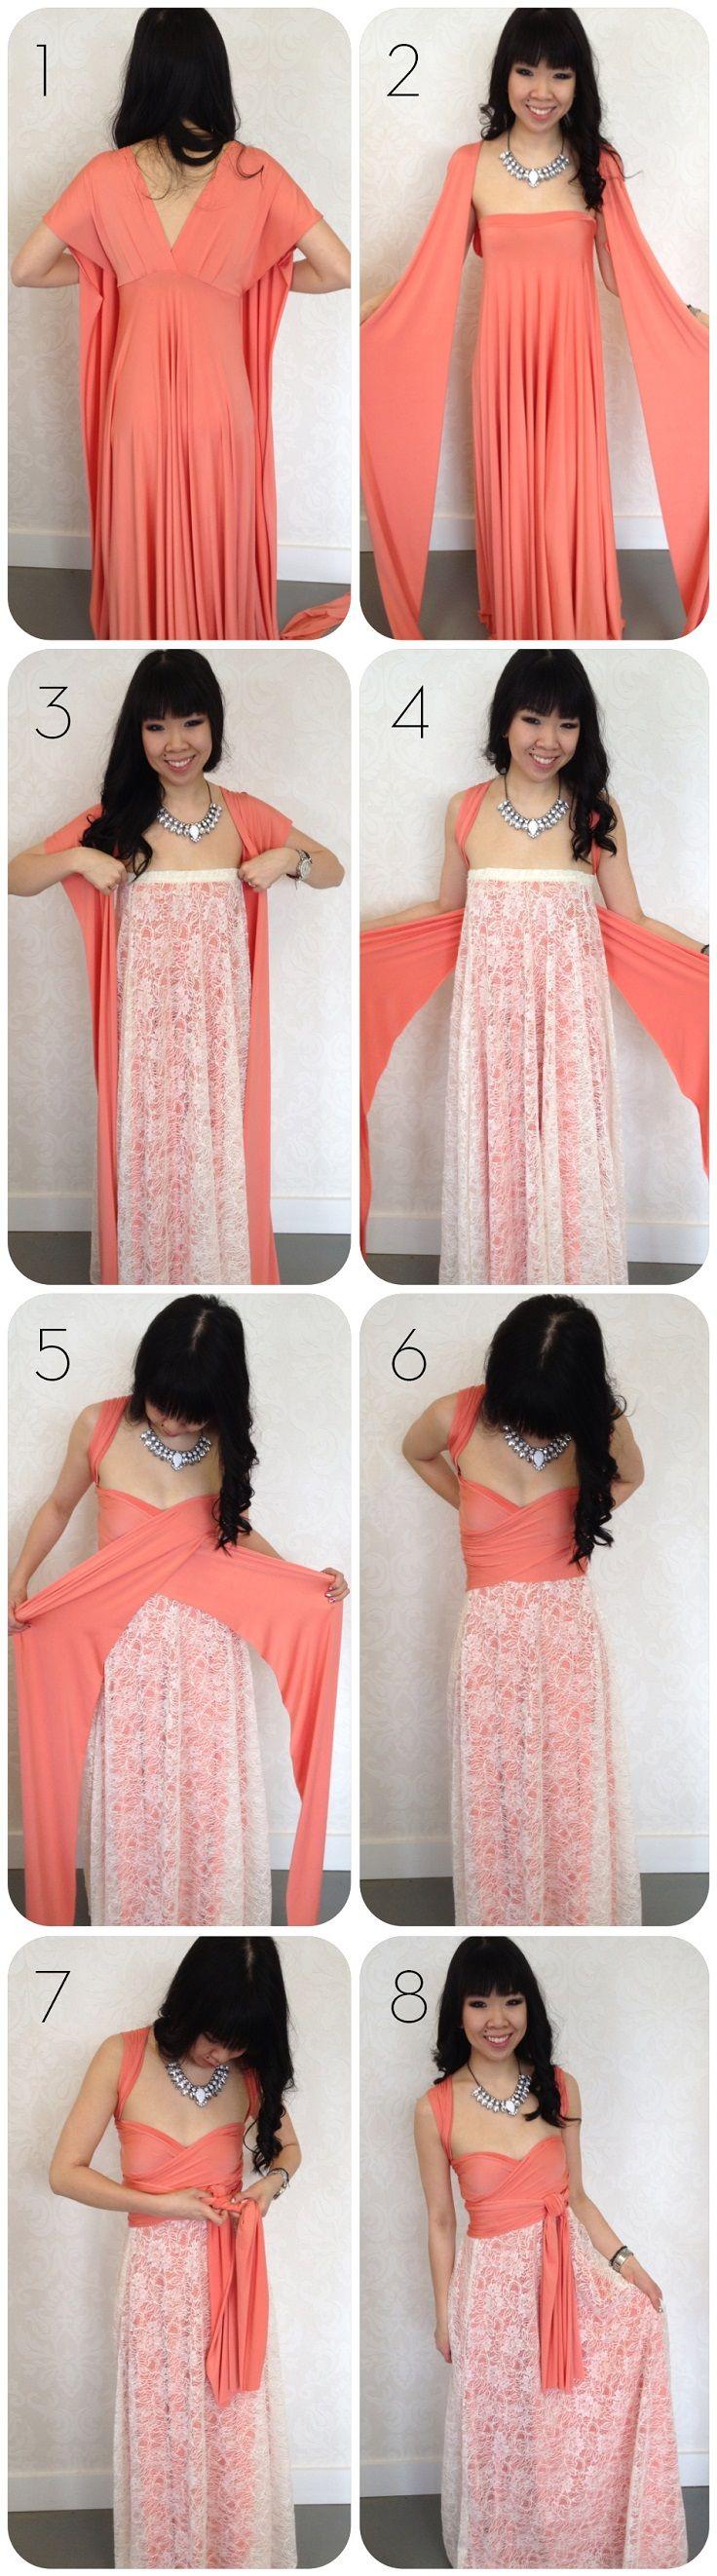 DIY Roundup – Holiday Party Dresses — Sew DIY